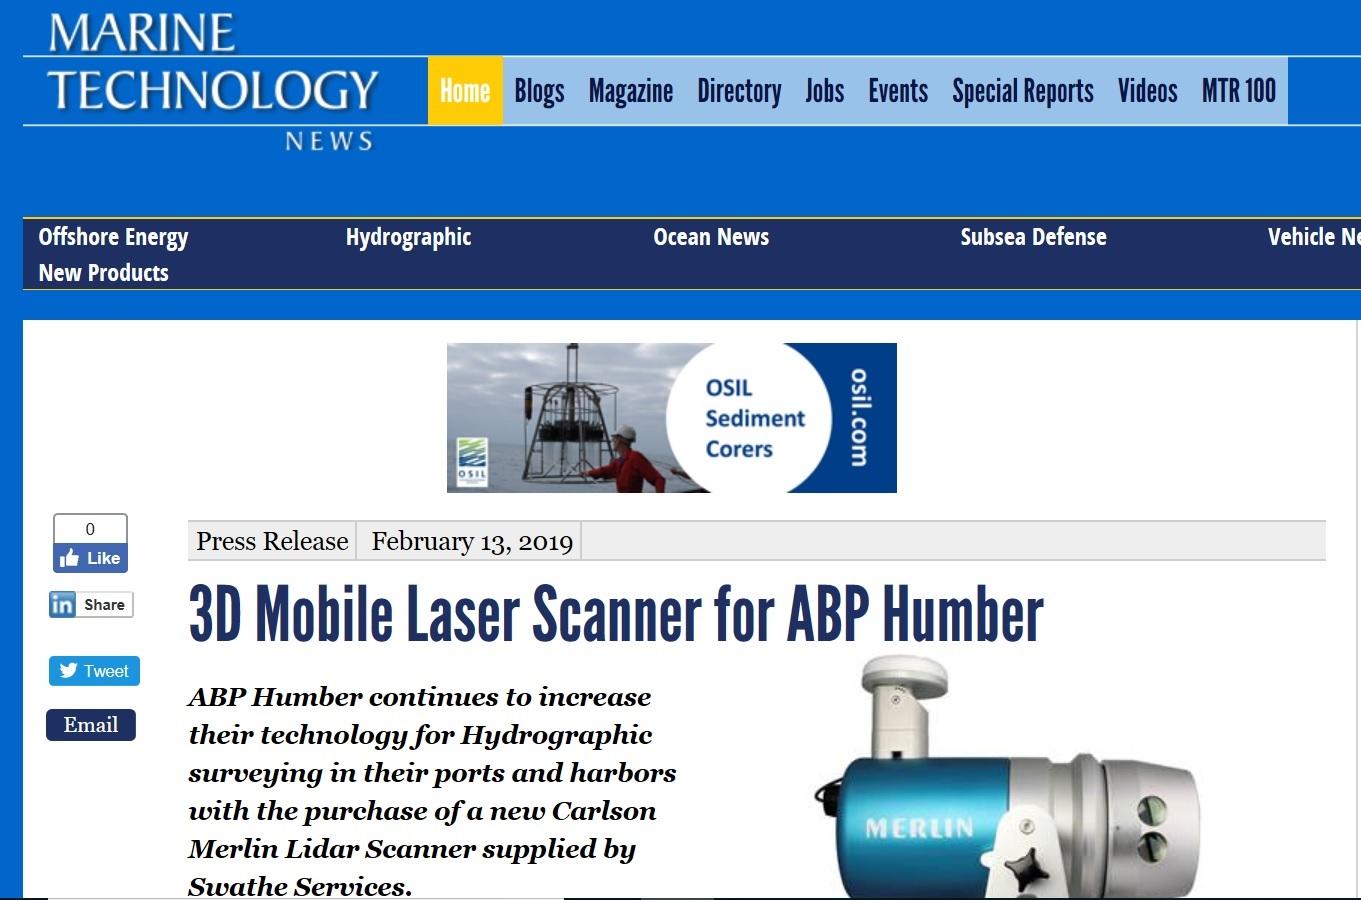 marine technology news feb 19